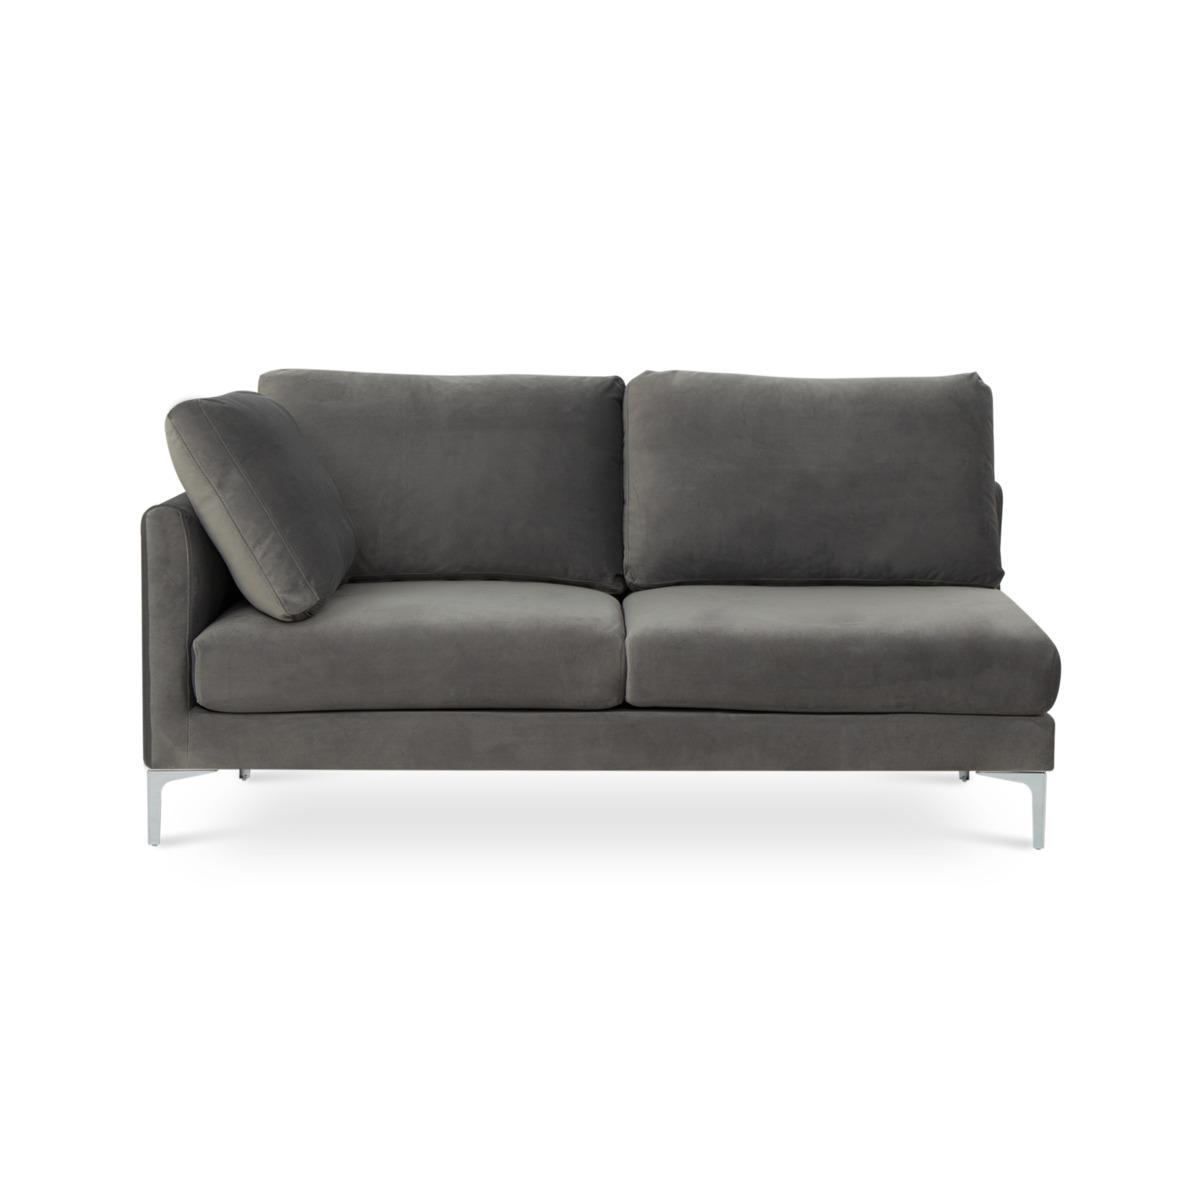 Adams 2-Seater Left Facing, Fog Grey Velvet (Silver Leg)